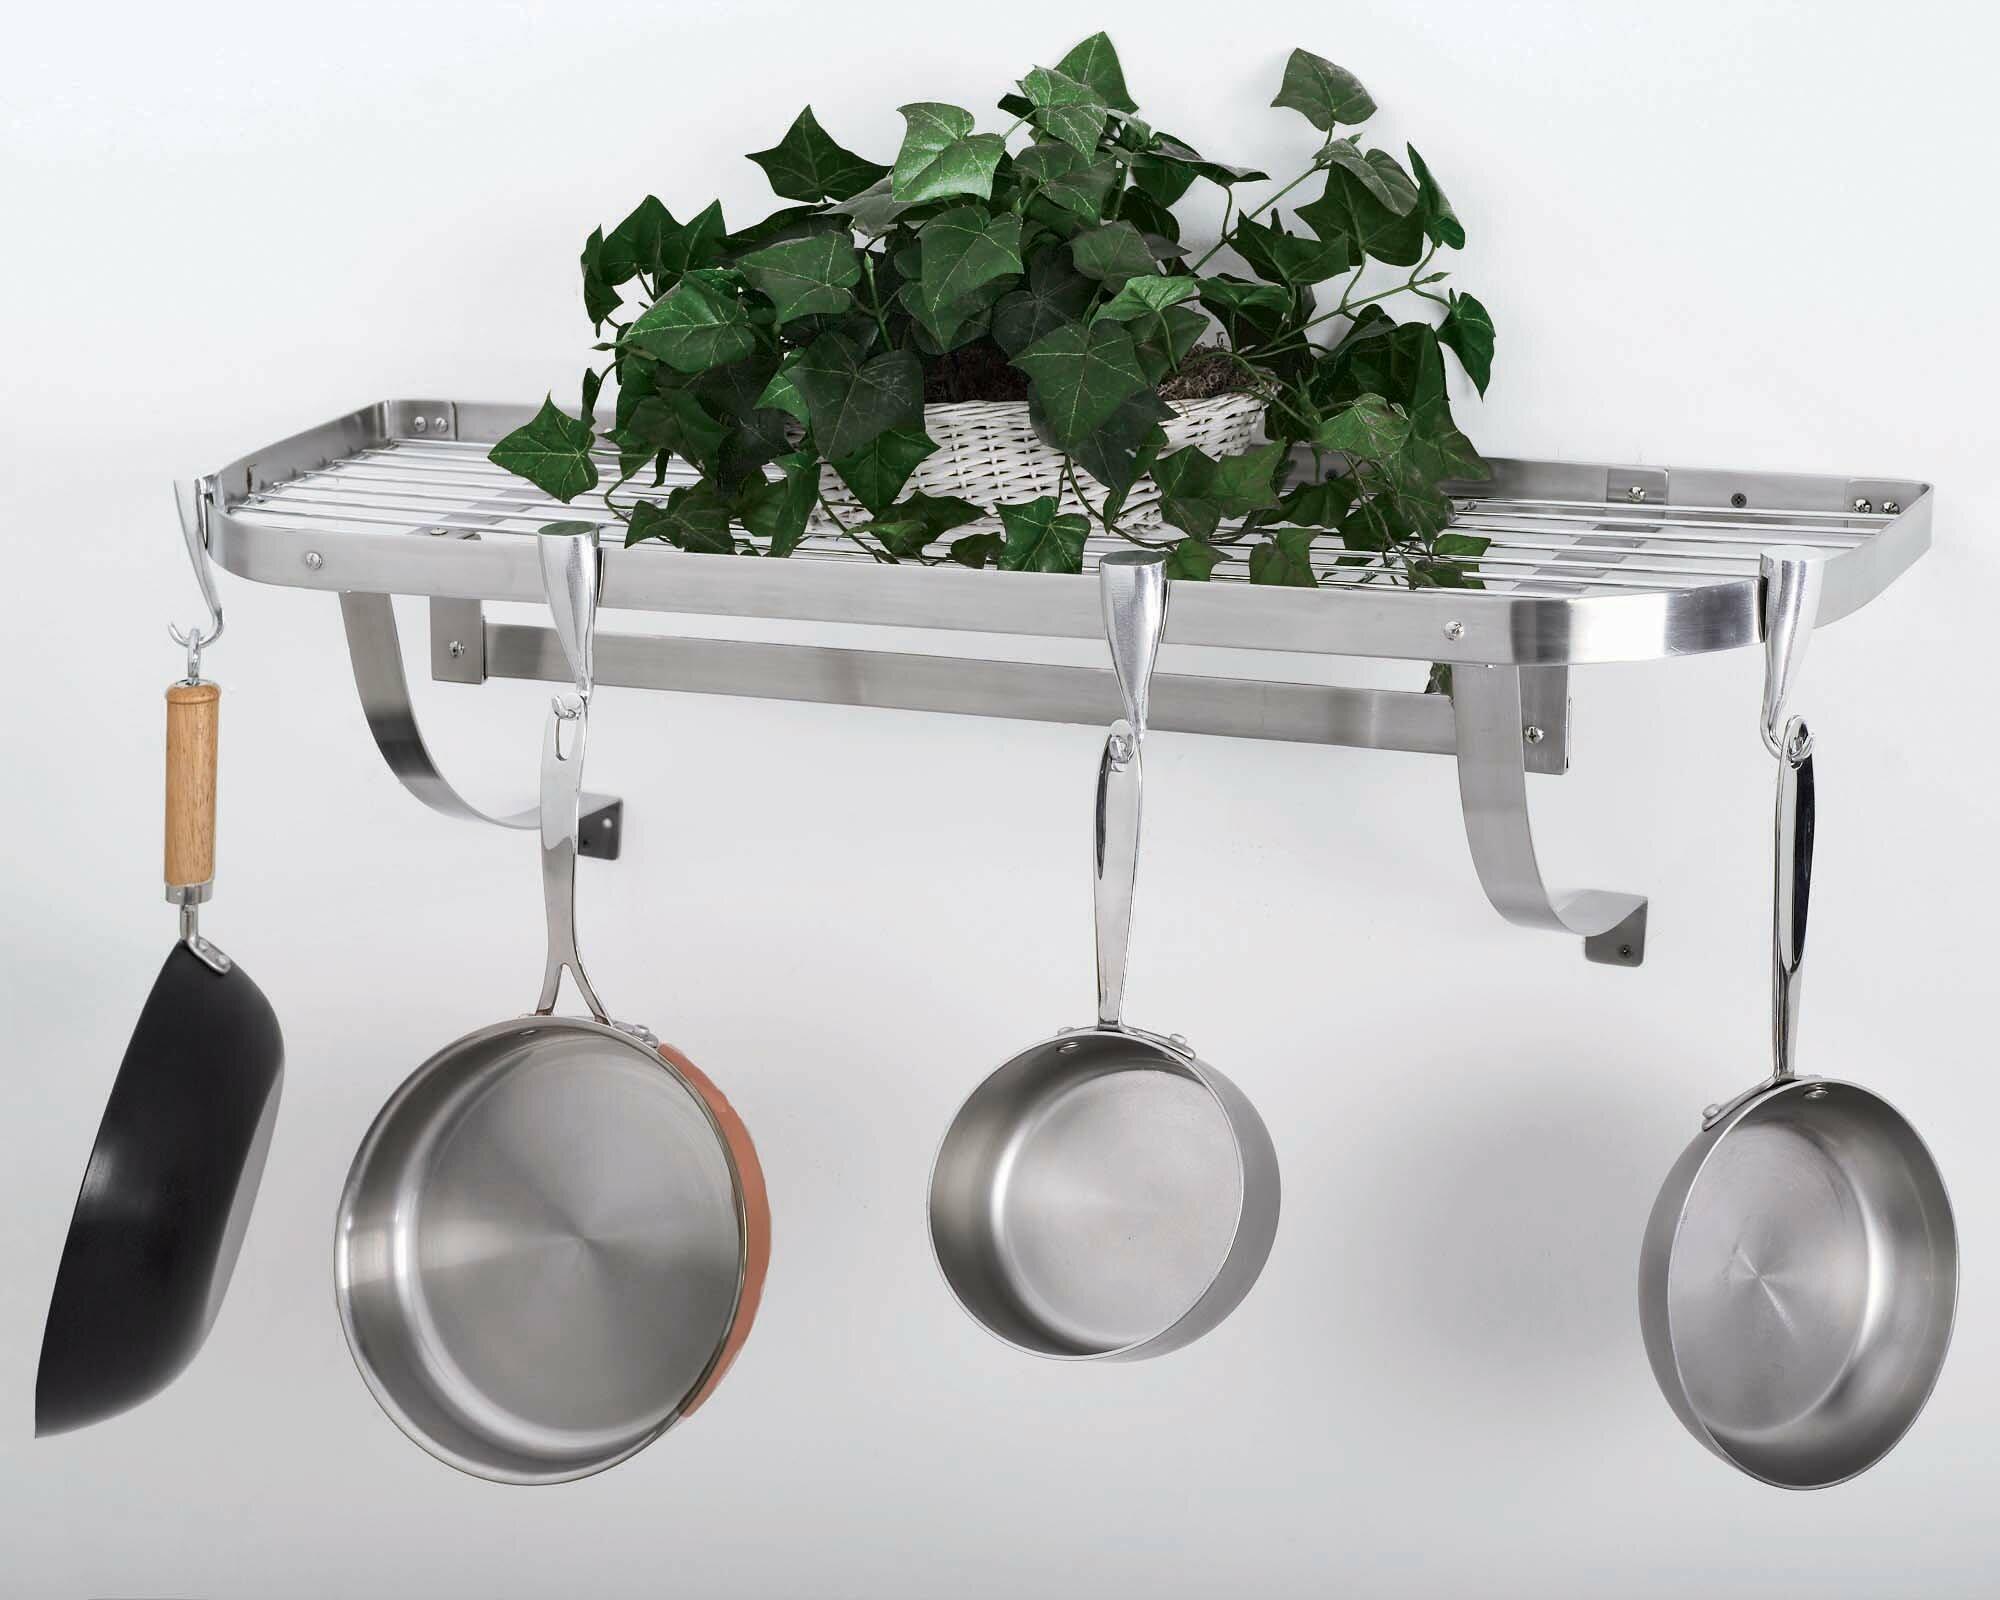 concept housewares stainless steel wall mounted pot rack ebay. Black Bedroom Furniture Sets. Home Design Ideas